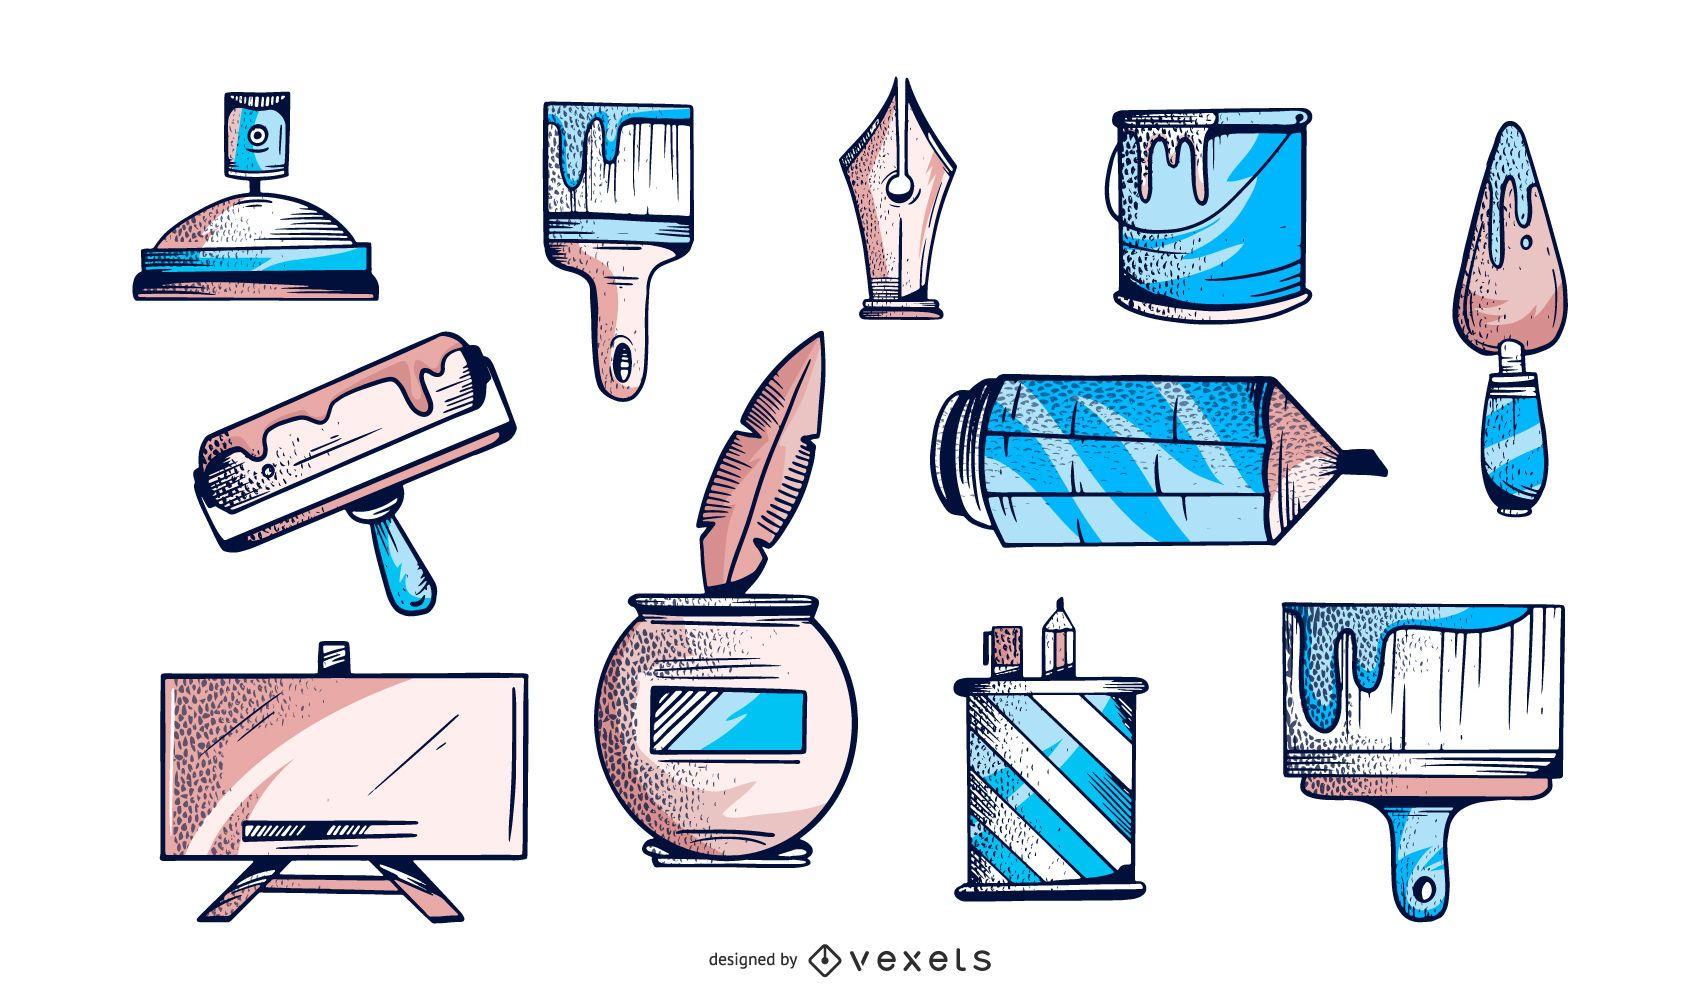 Coleção Artist Illustrated Elements